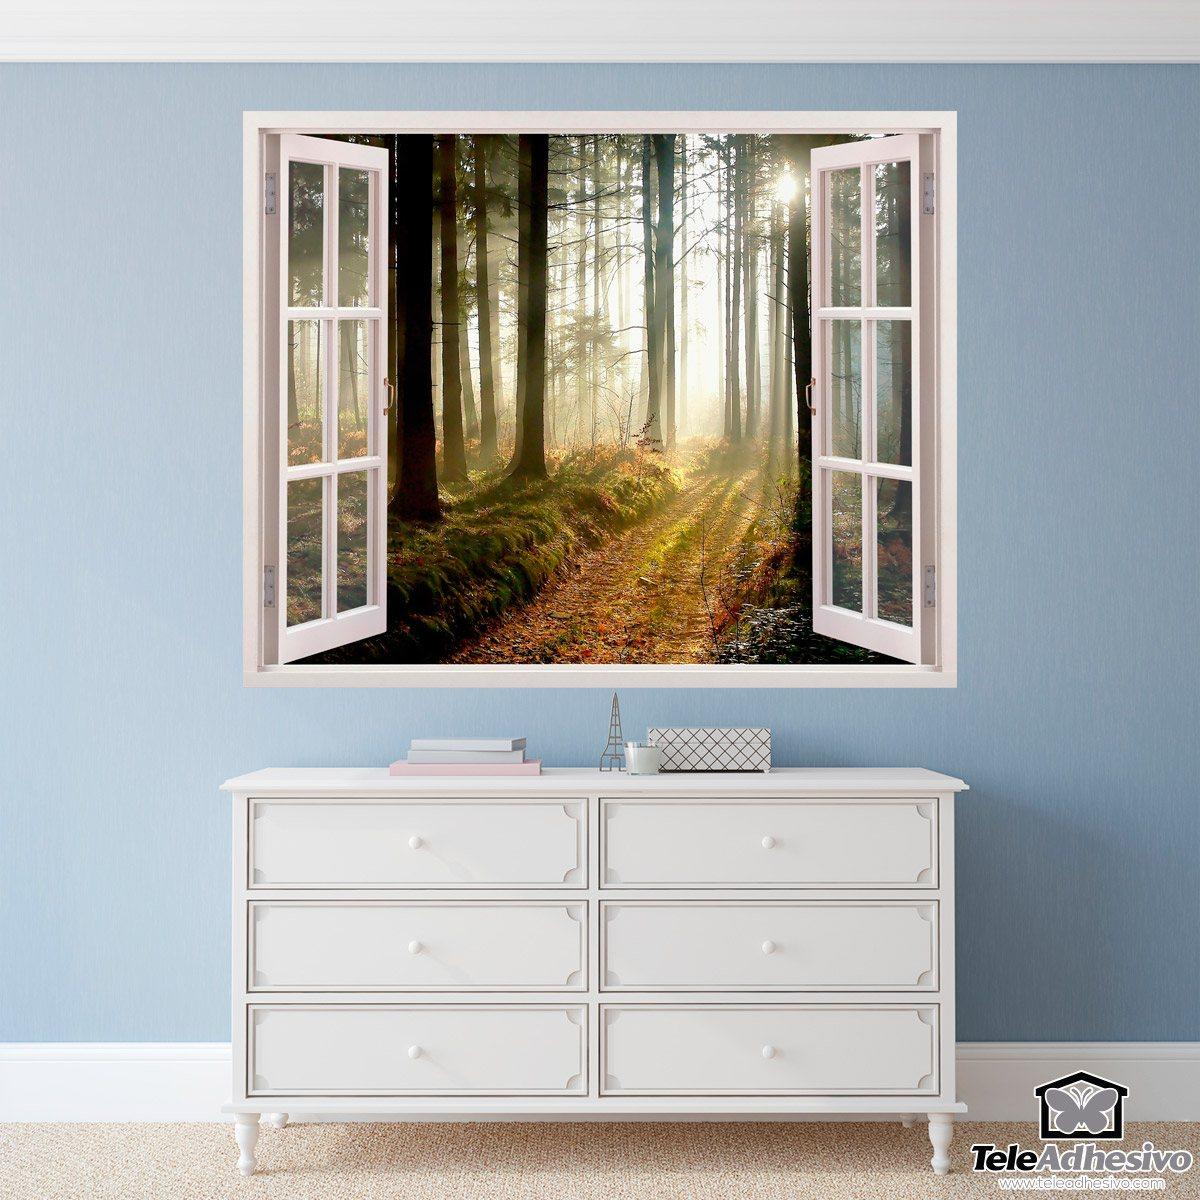 Wandtattoos: Bäume im Wald